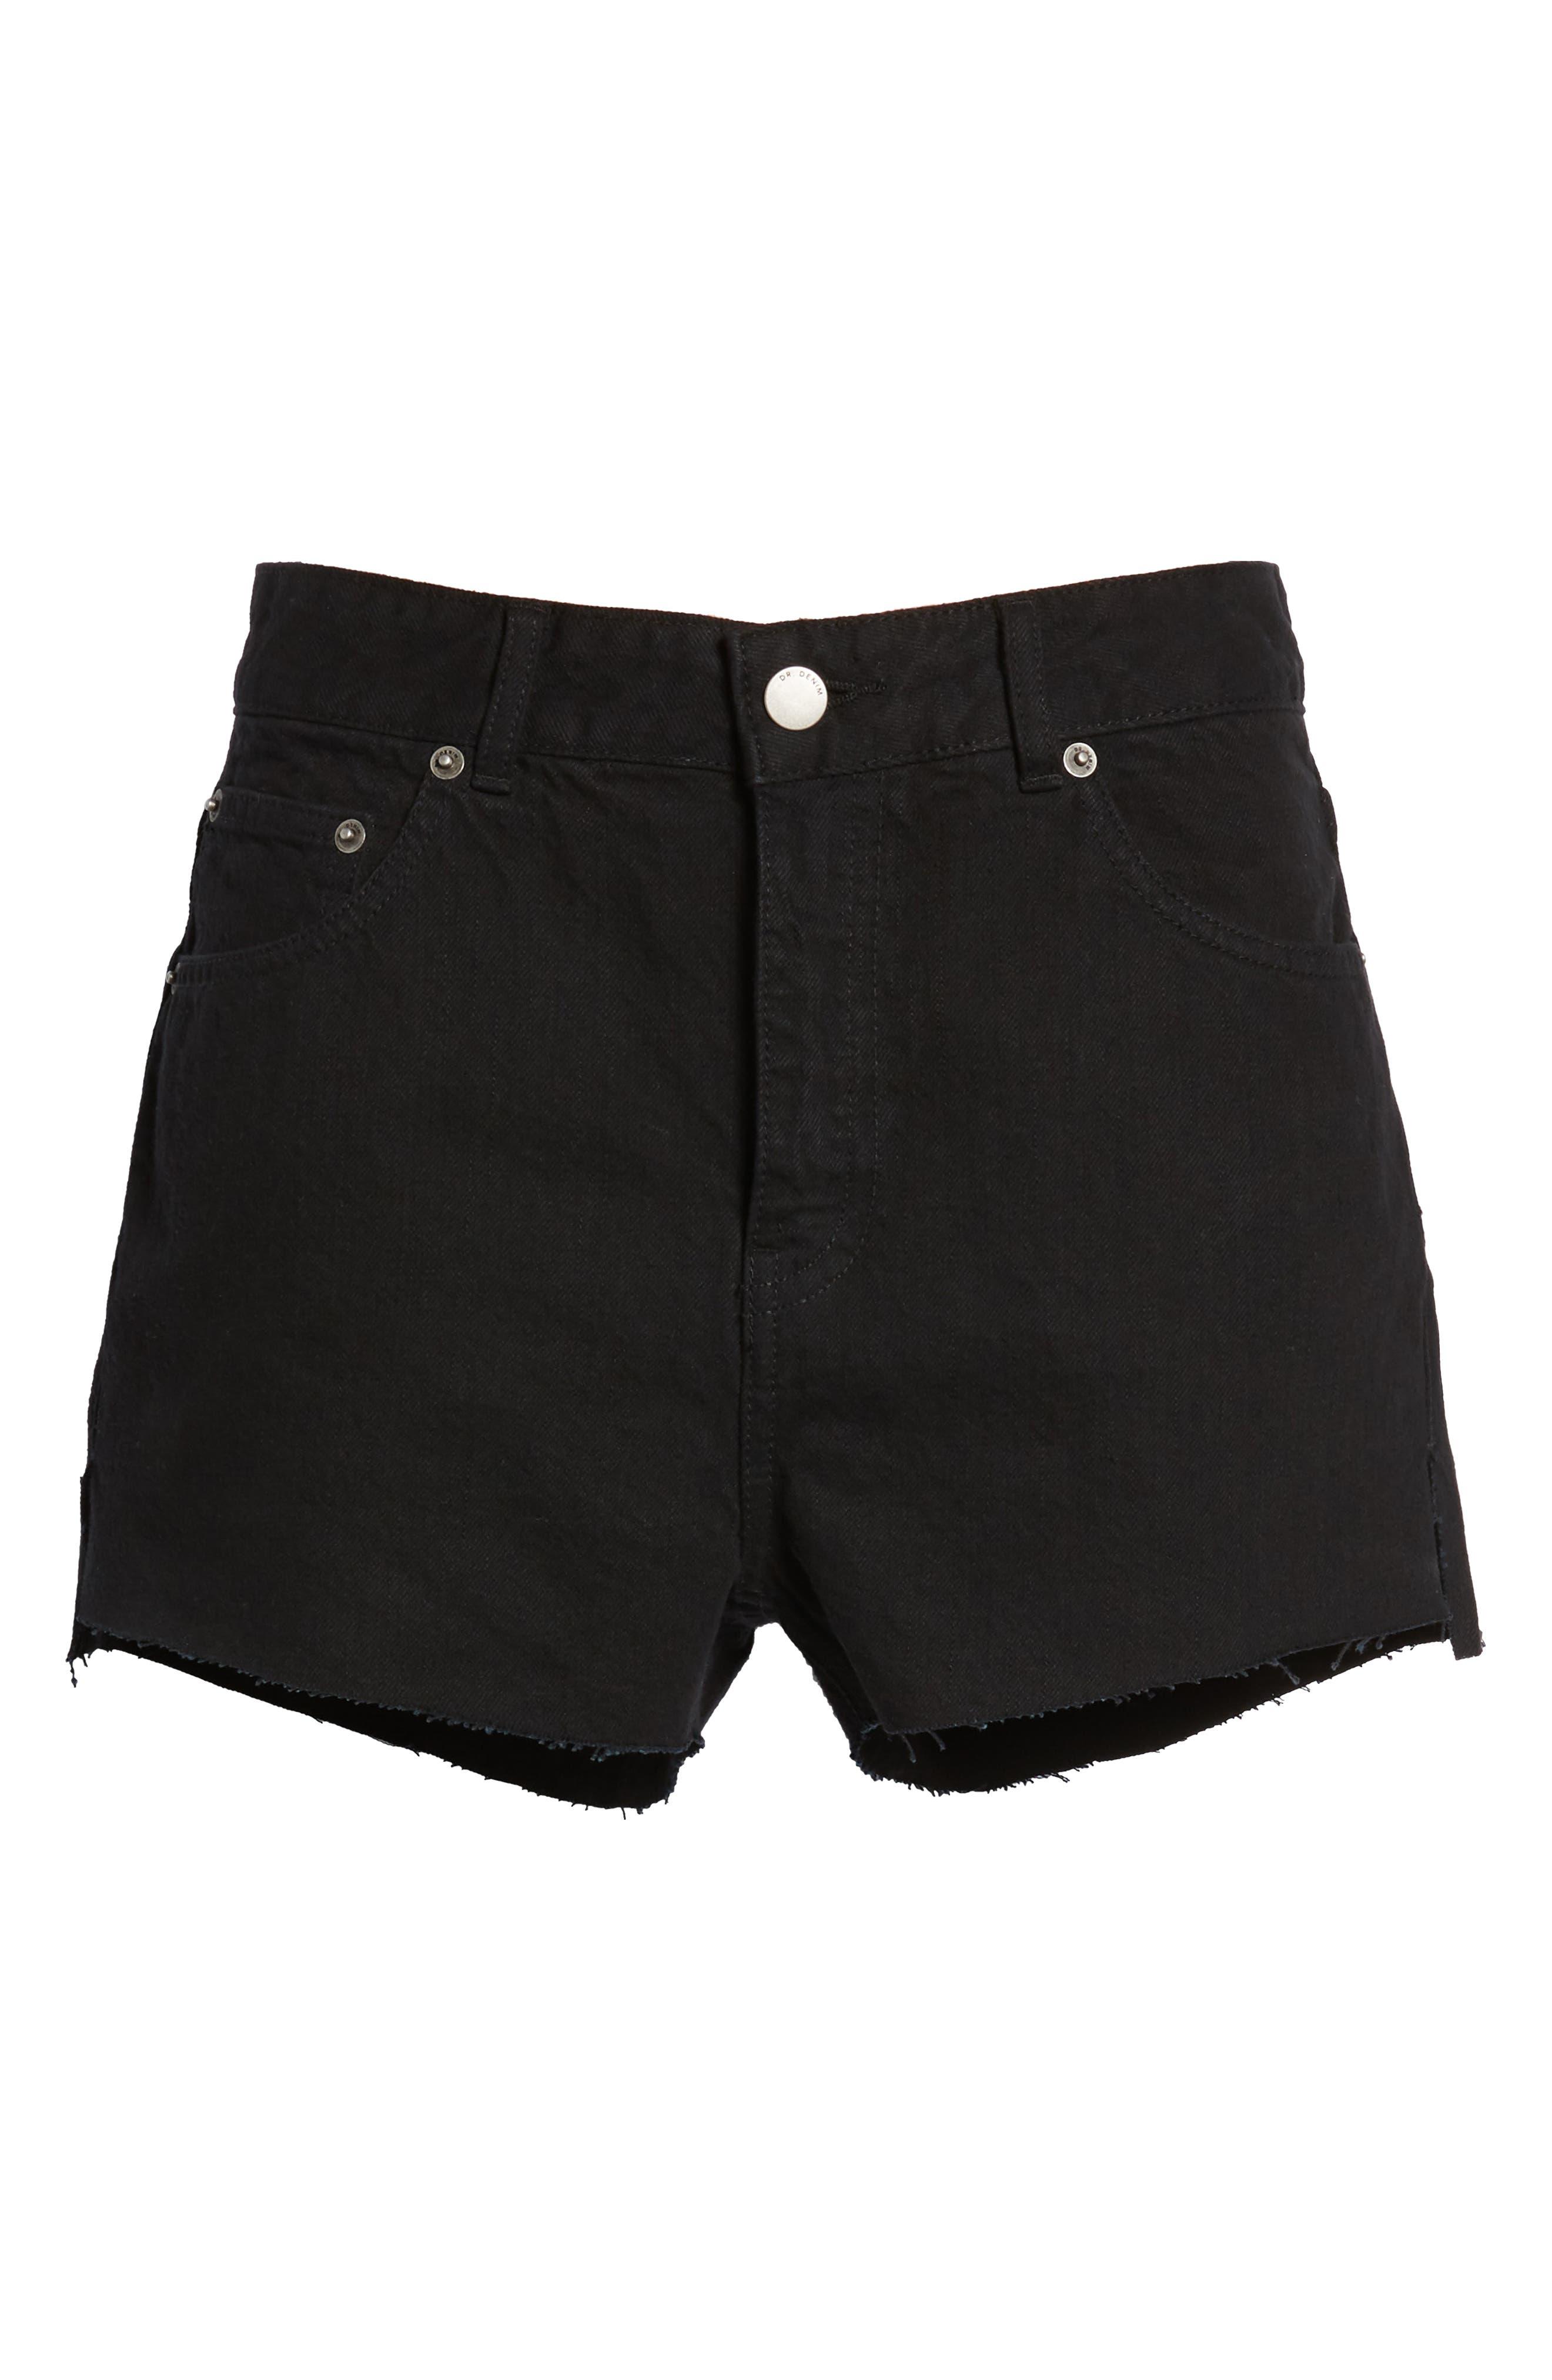 Vega Denim Shorts,                             Alternate thumbnail 7, color,                             001